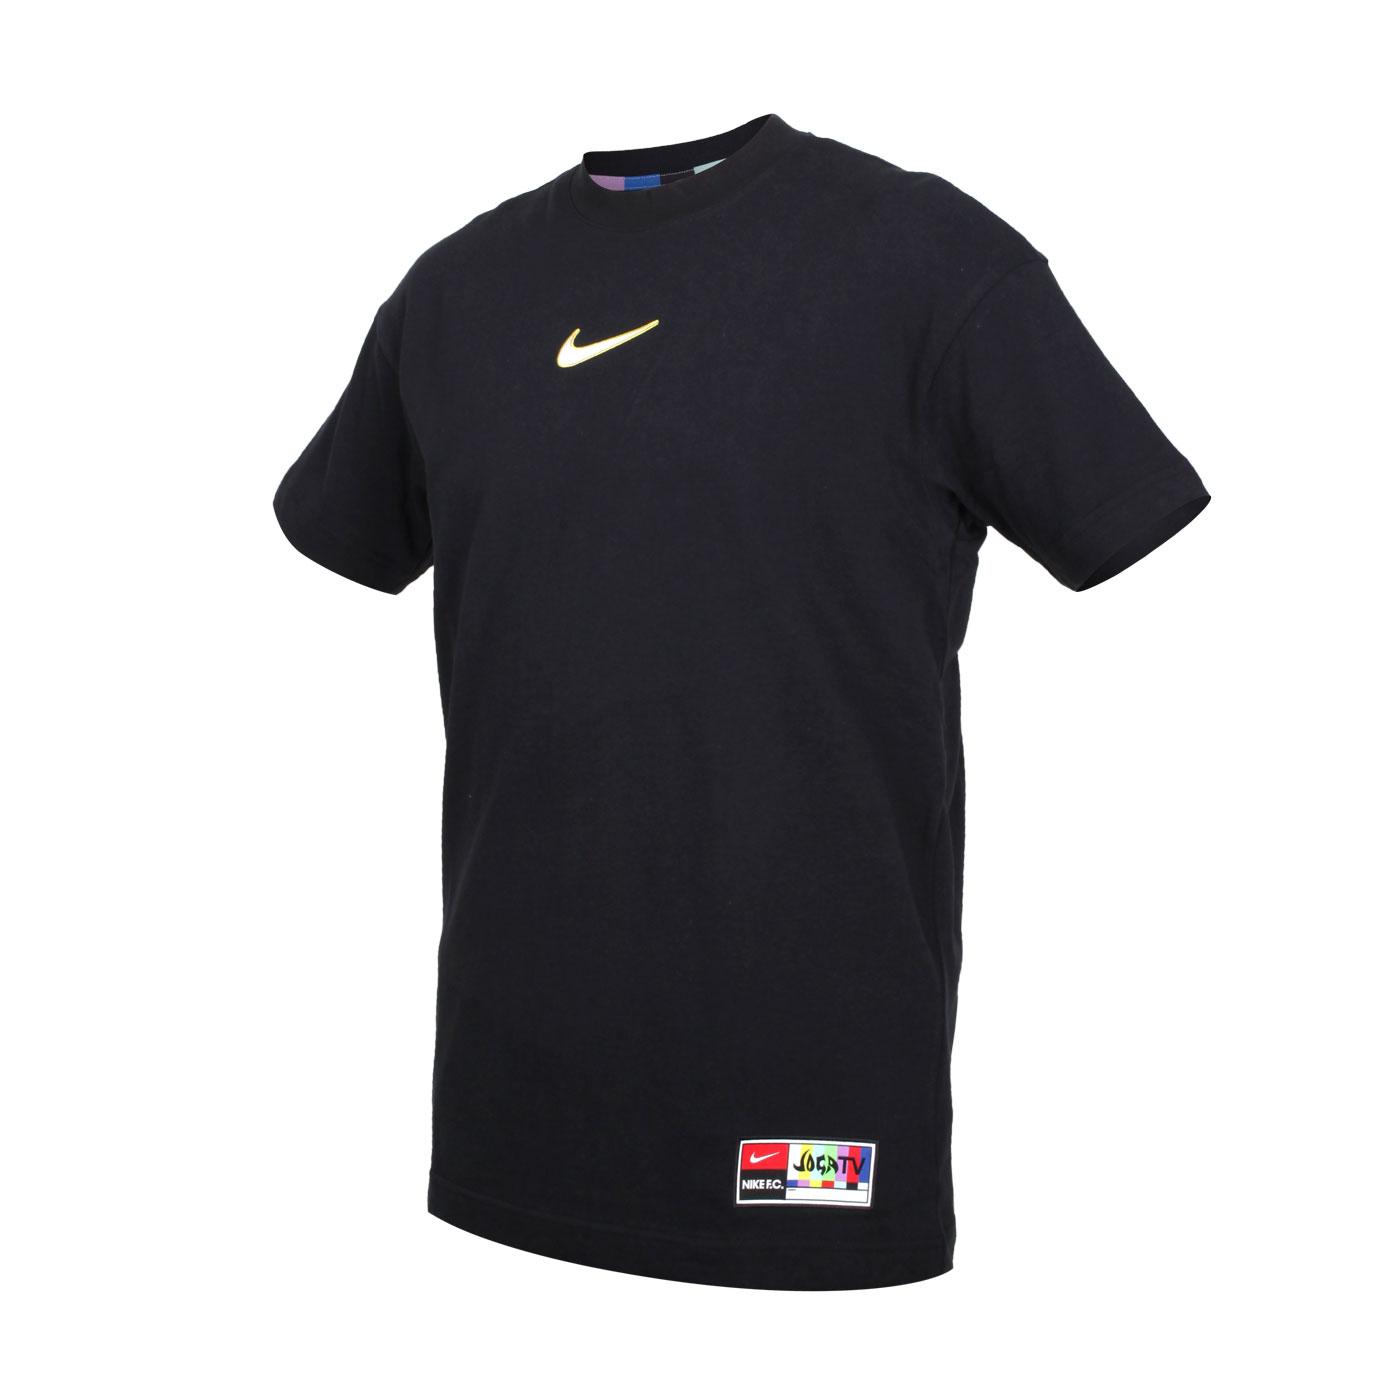 NIKE 男款短袖T恤 CZ1010-010